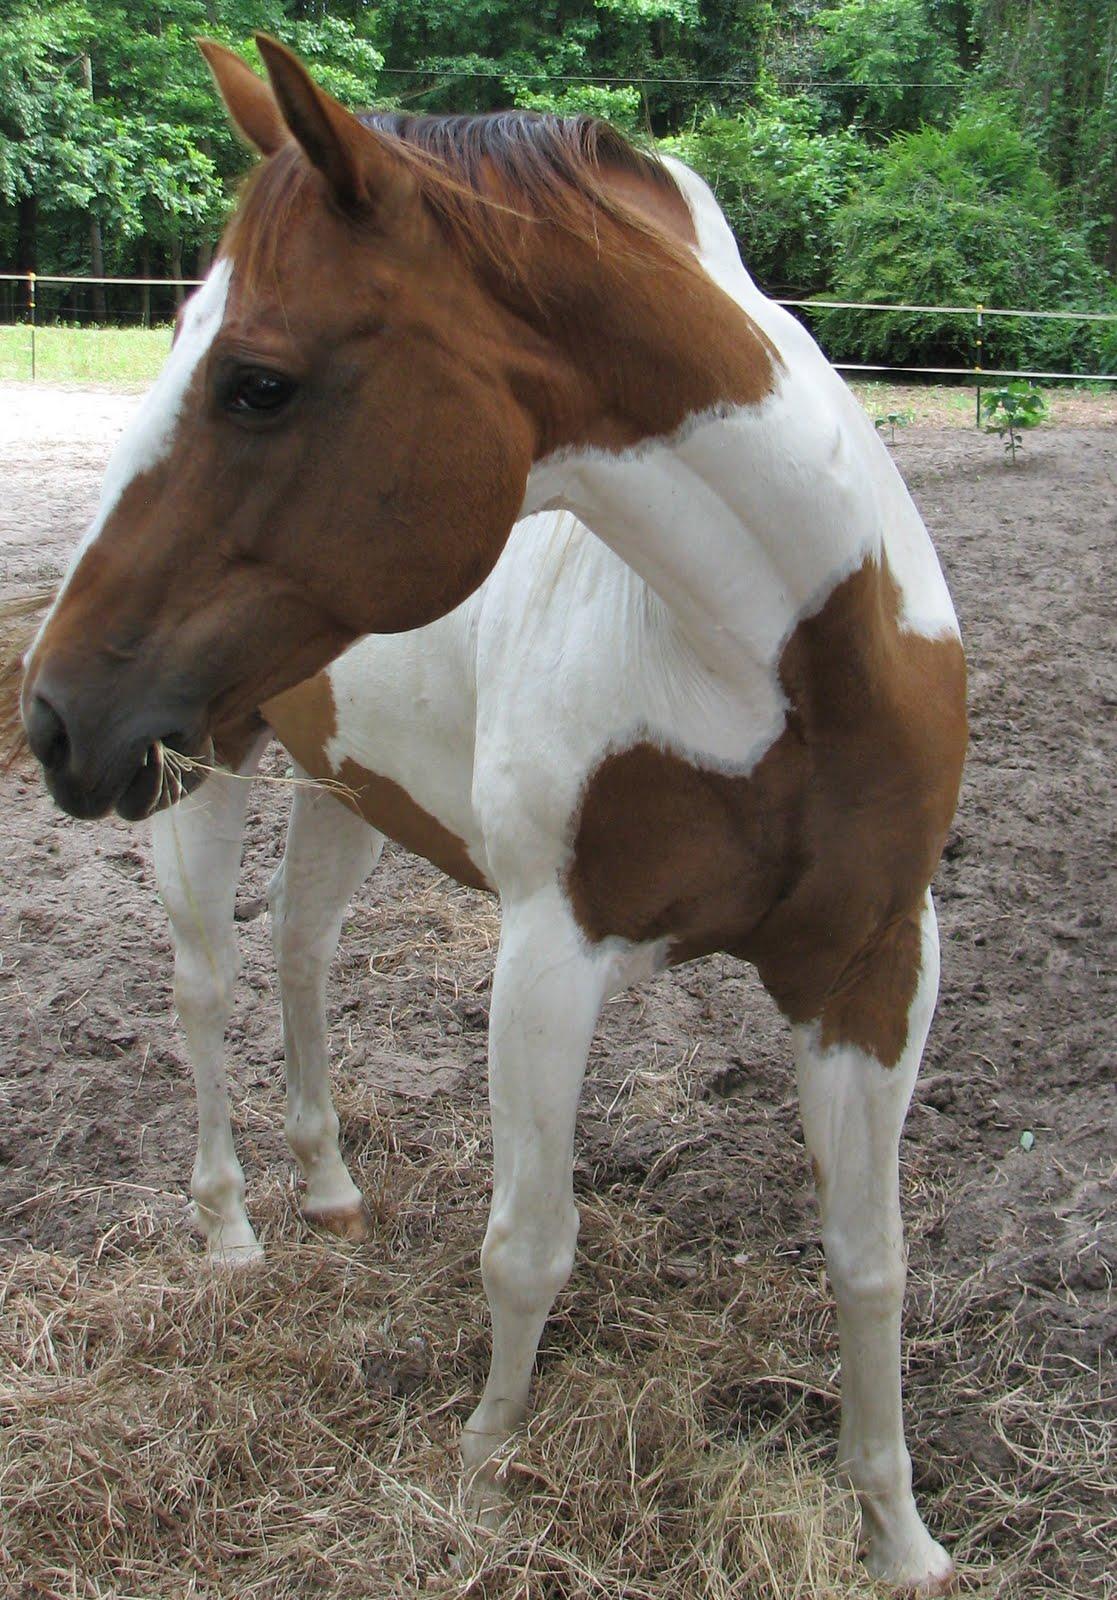 Horse issues. Again.